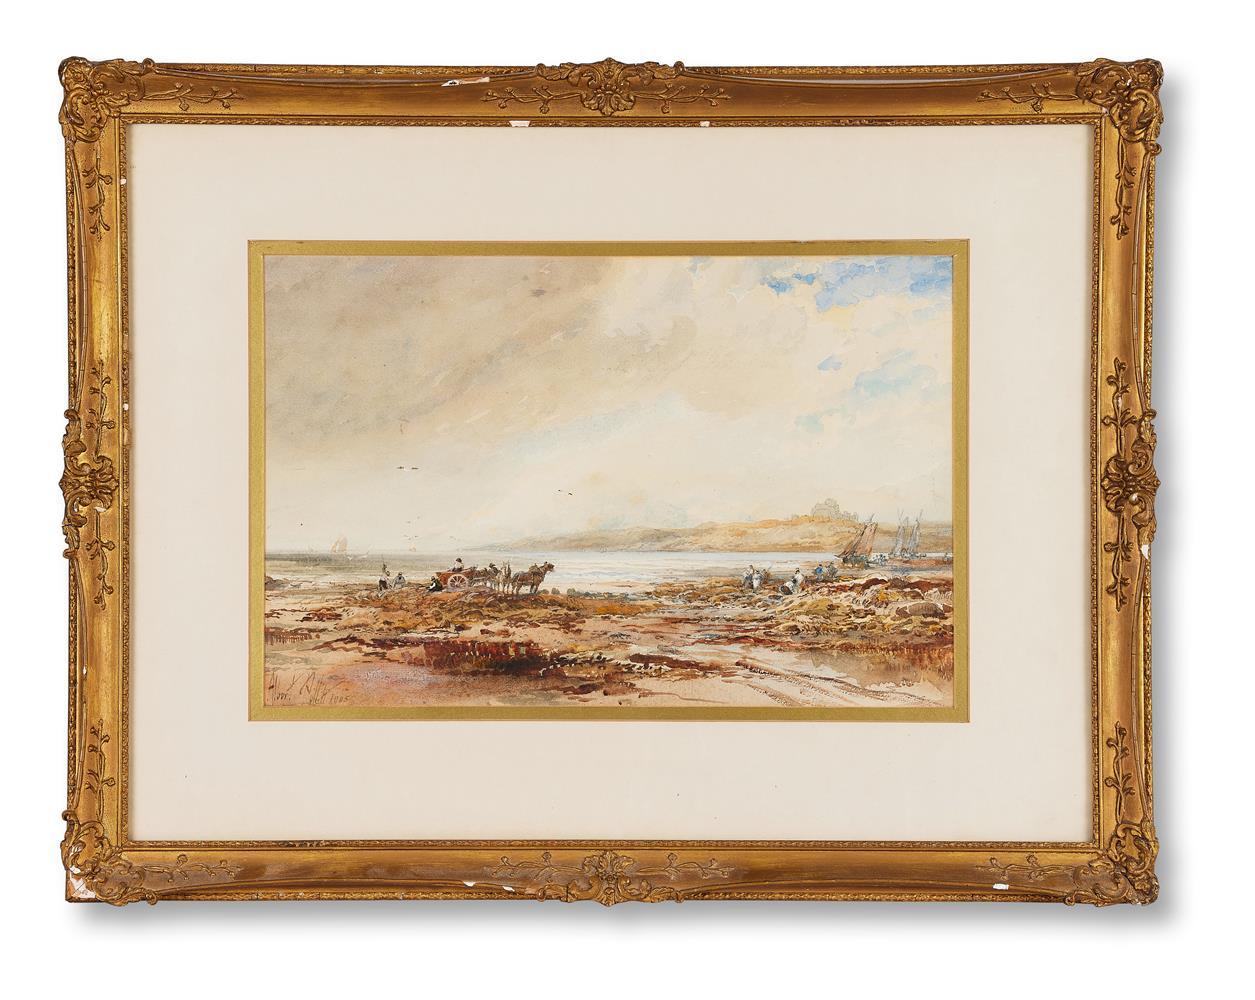 ALBERT POLLITT (BRITISH 1856-1926), KELP GATHERING